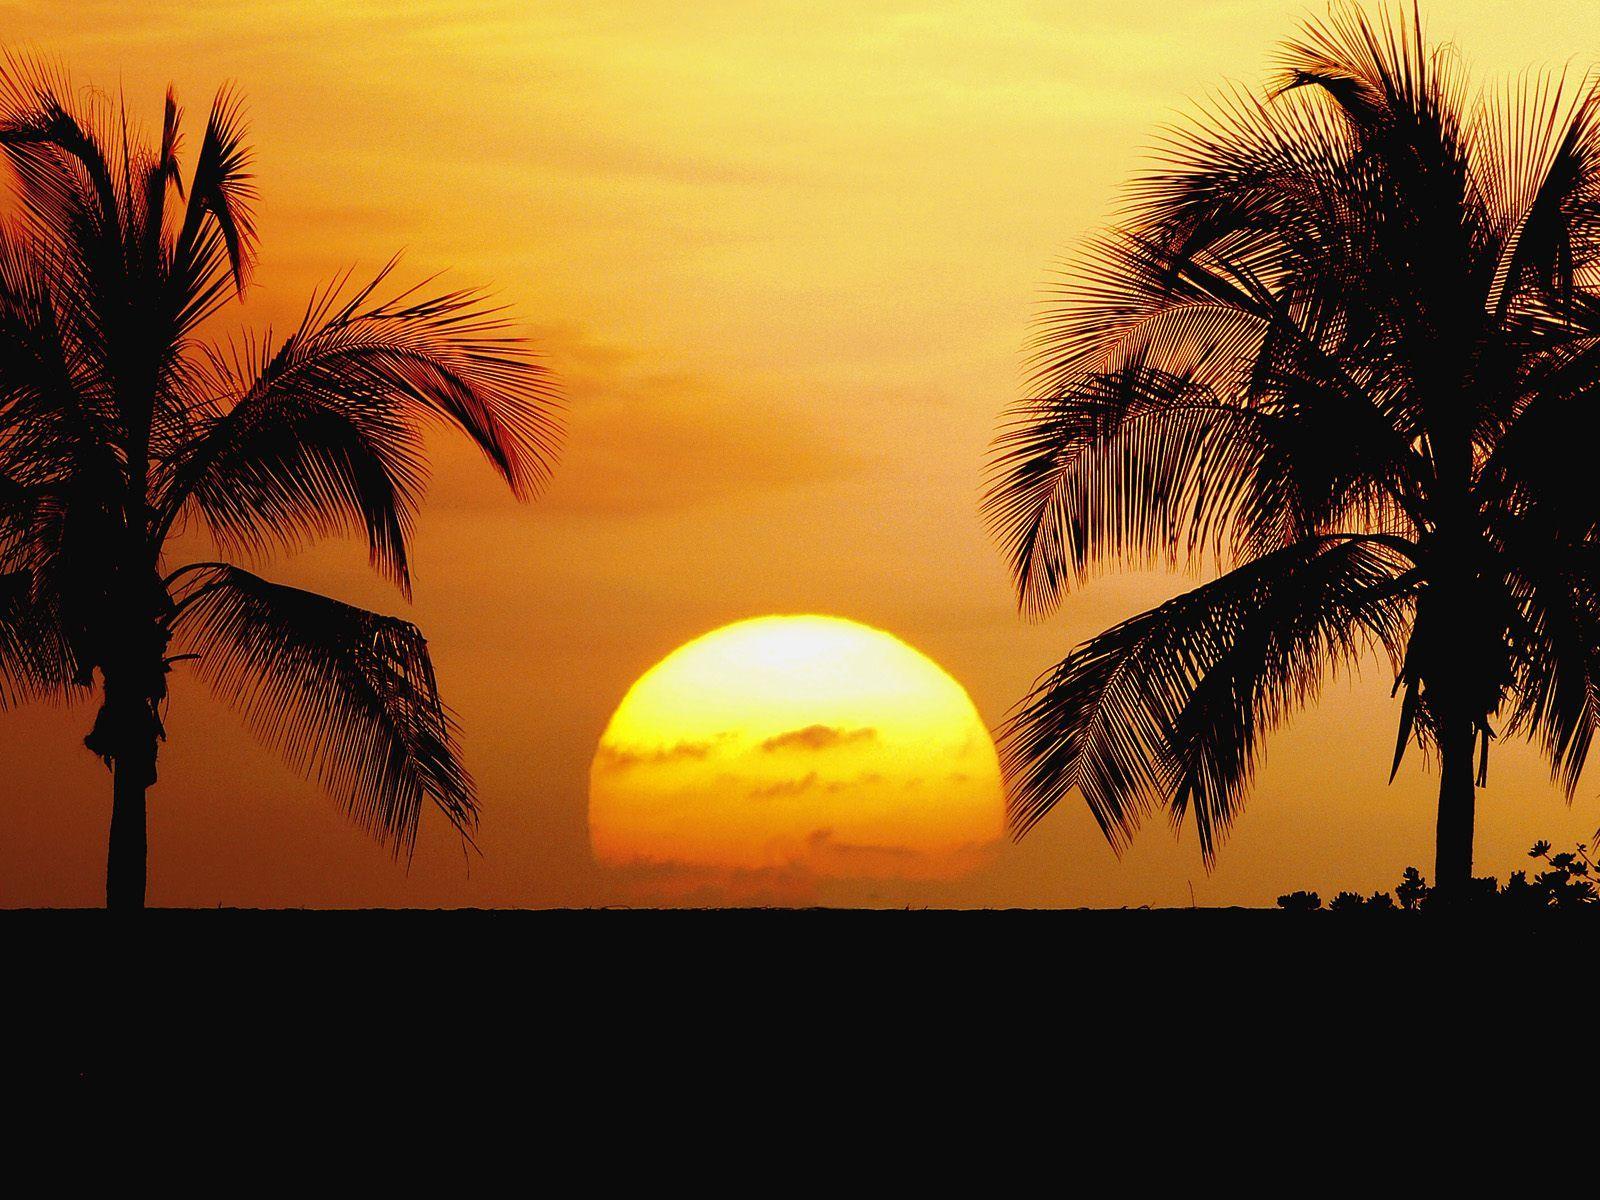 ... Dream Wedding With Hawaii Beach Sunset Wallpaper | Best Travel Sites